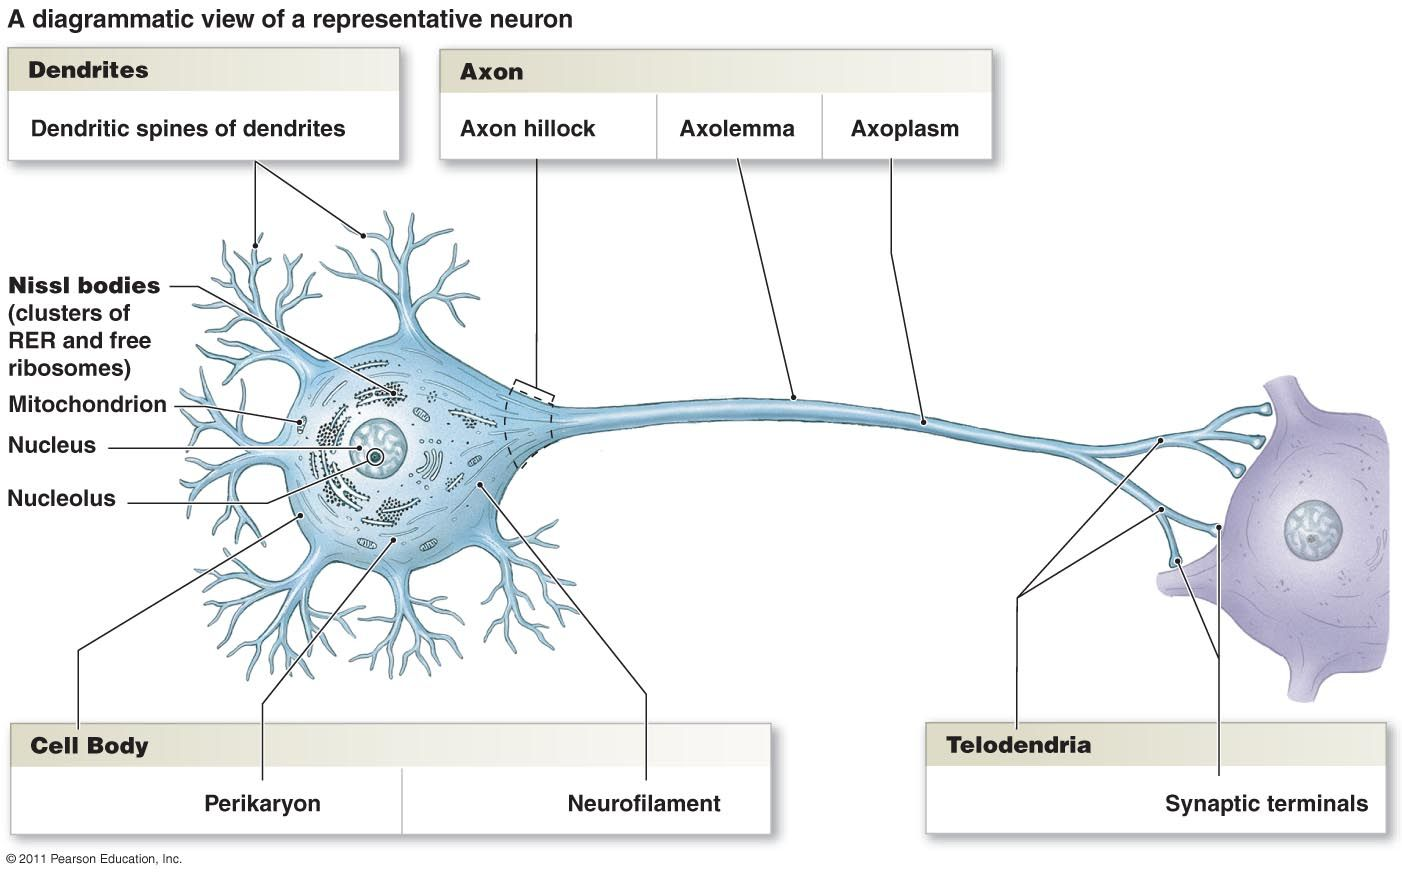 diagrammatic view of a representative neuron neurons nervous system neuroscience biology diagram [ 1402 x 875 Pixel ]